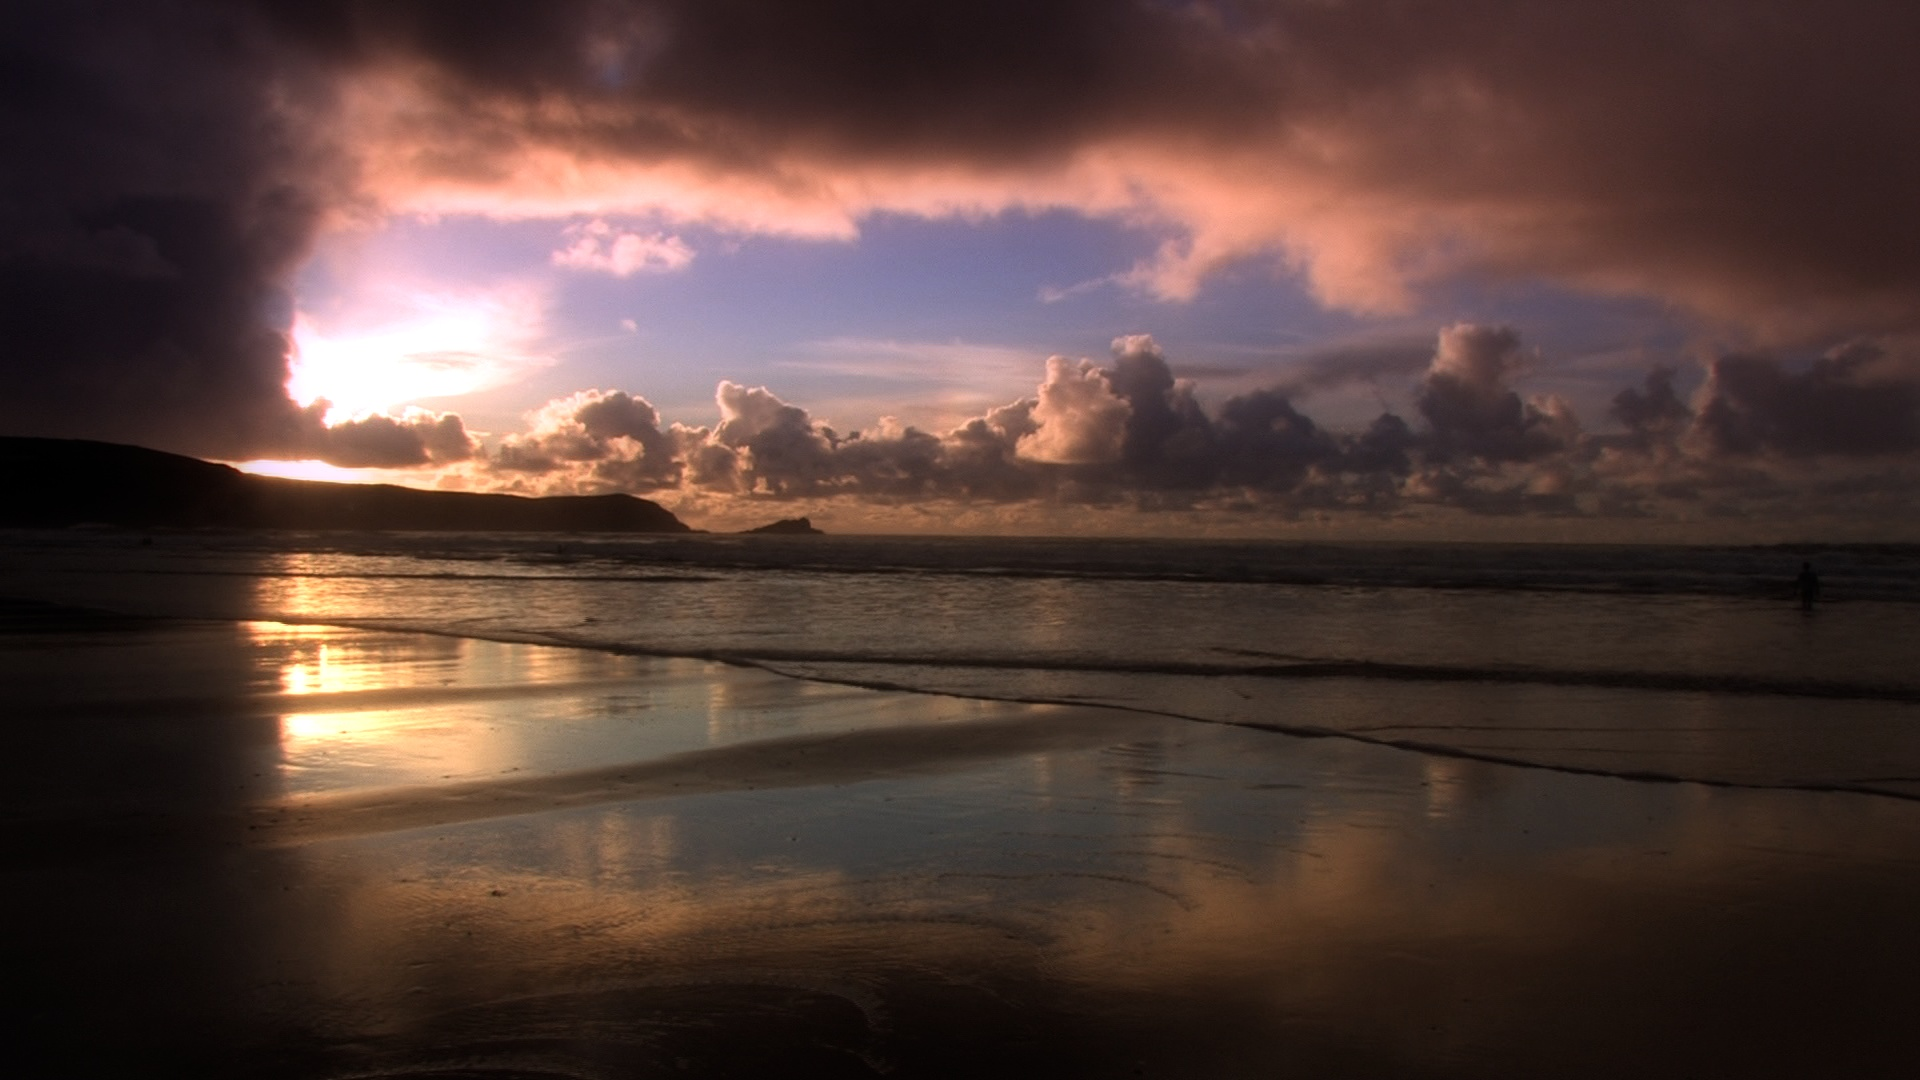 Fistral Beach - sunset 14/11/2010